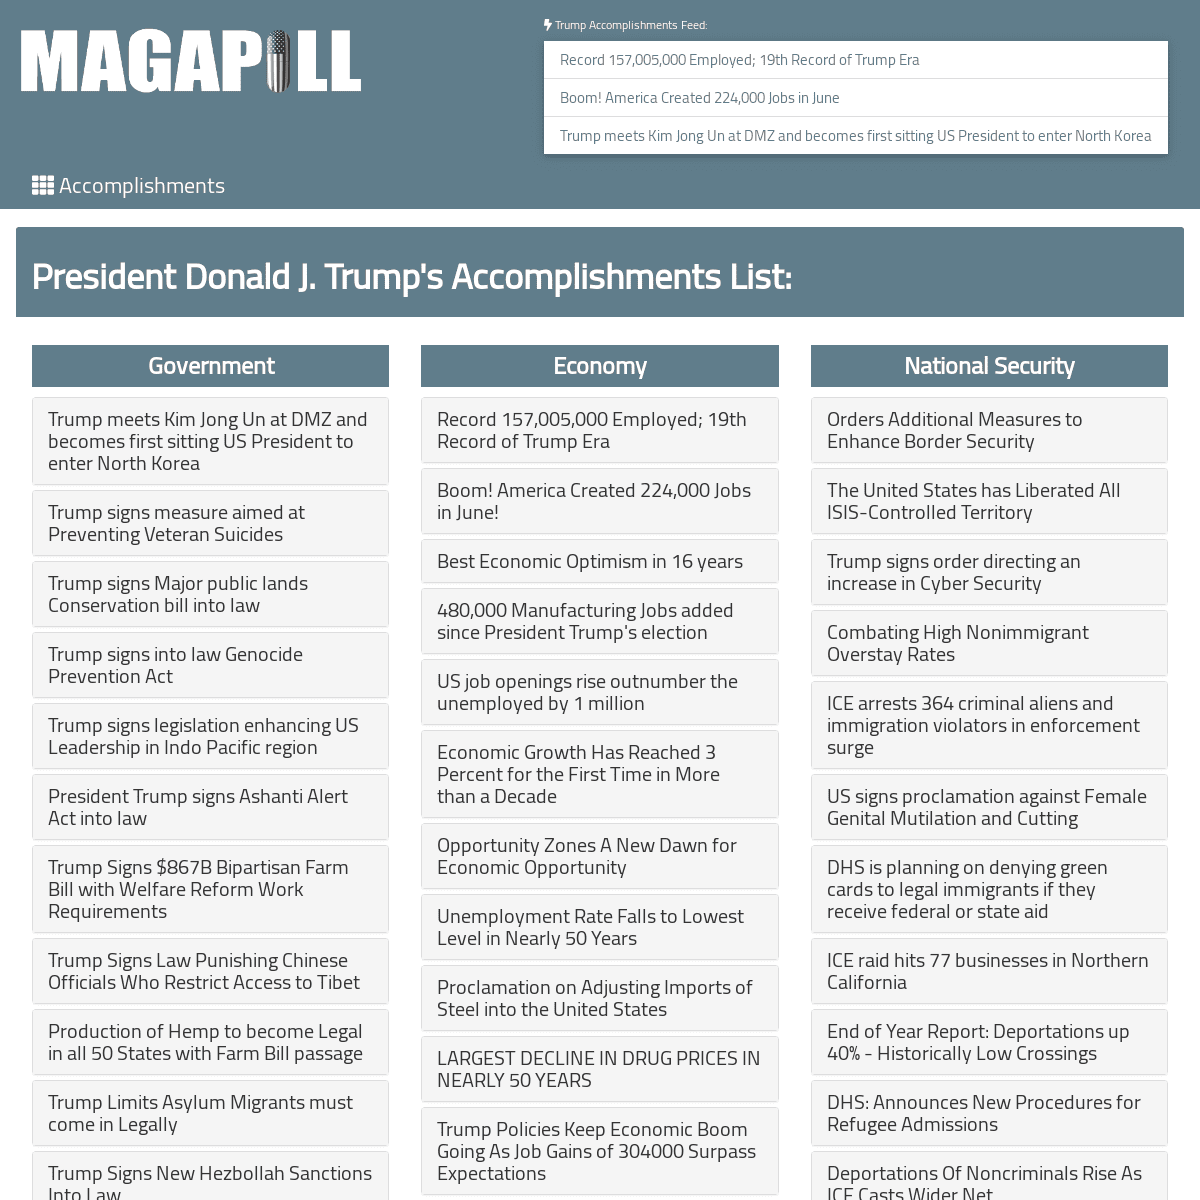 President Donald J. Trump's Accomplishments List - MAGA PILL